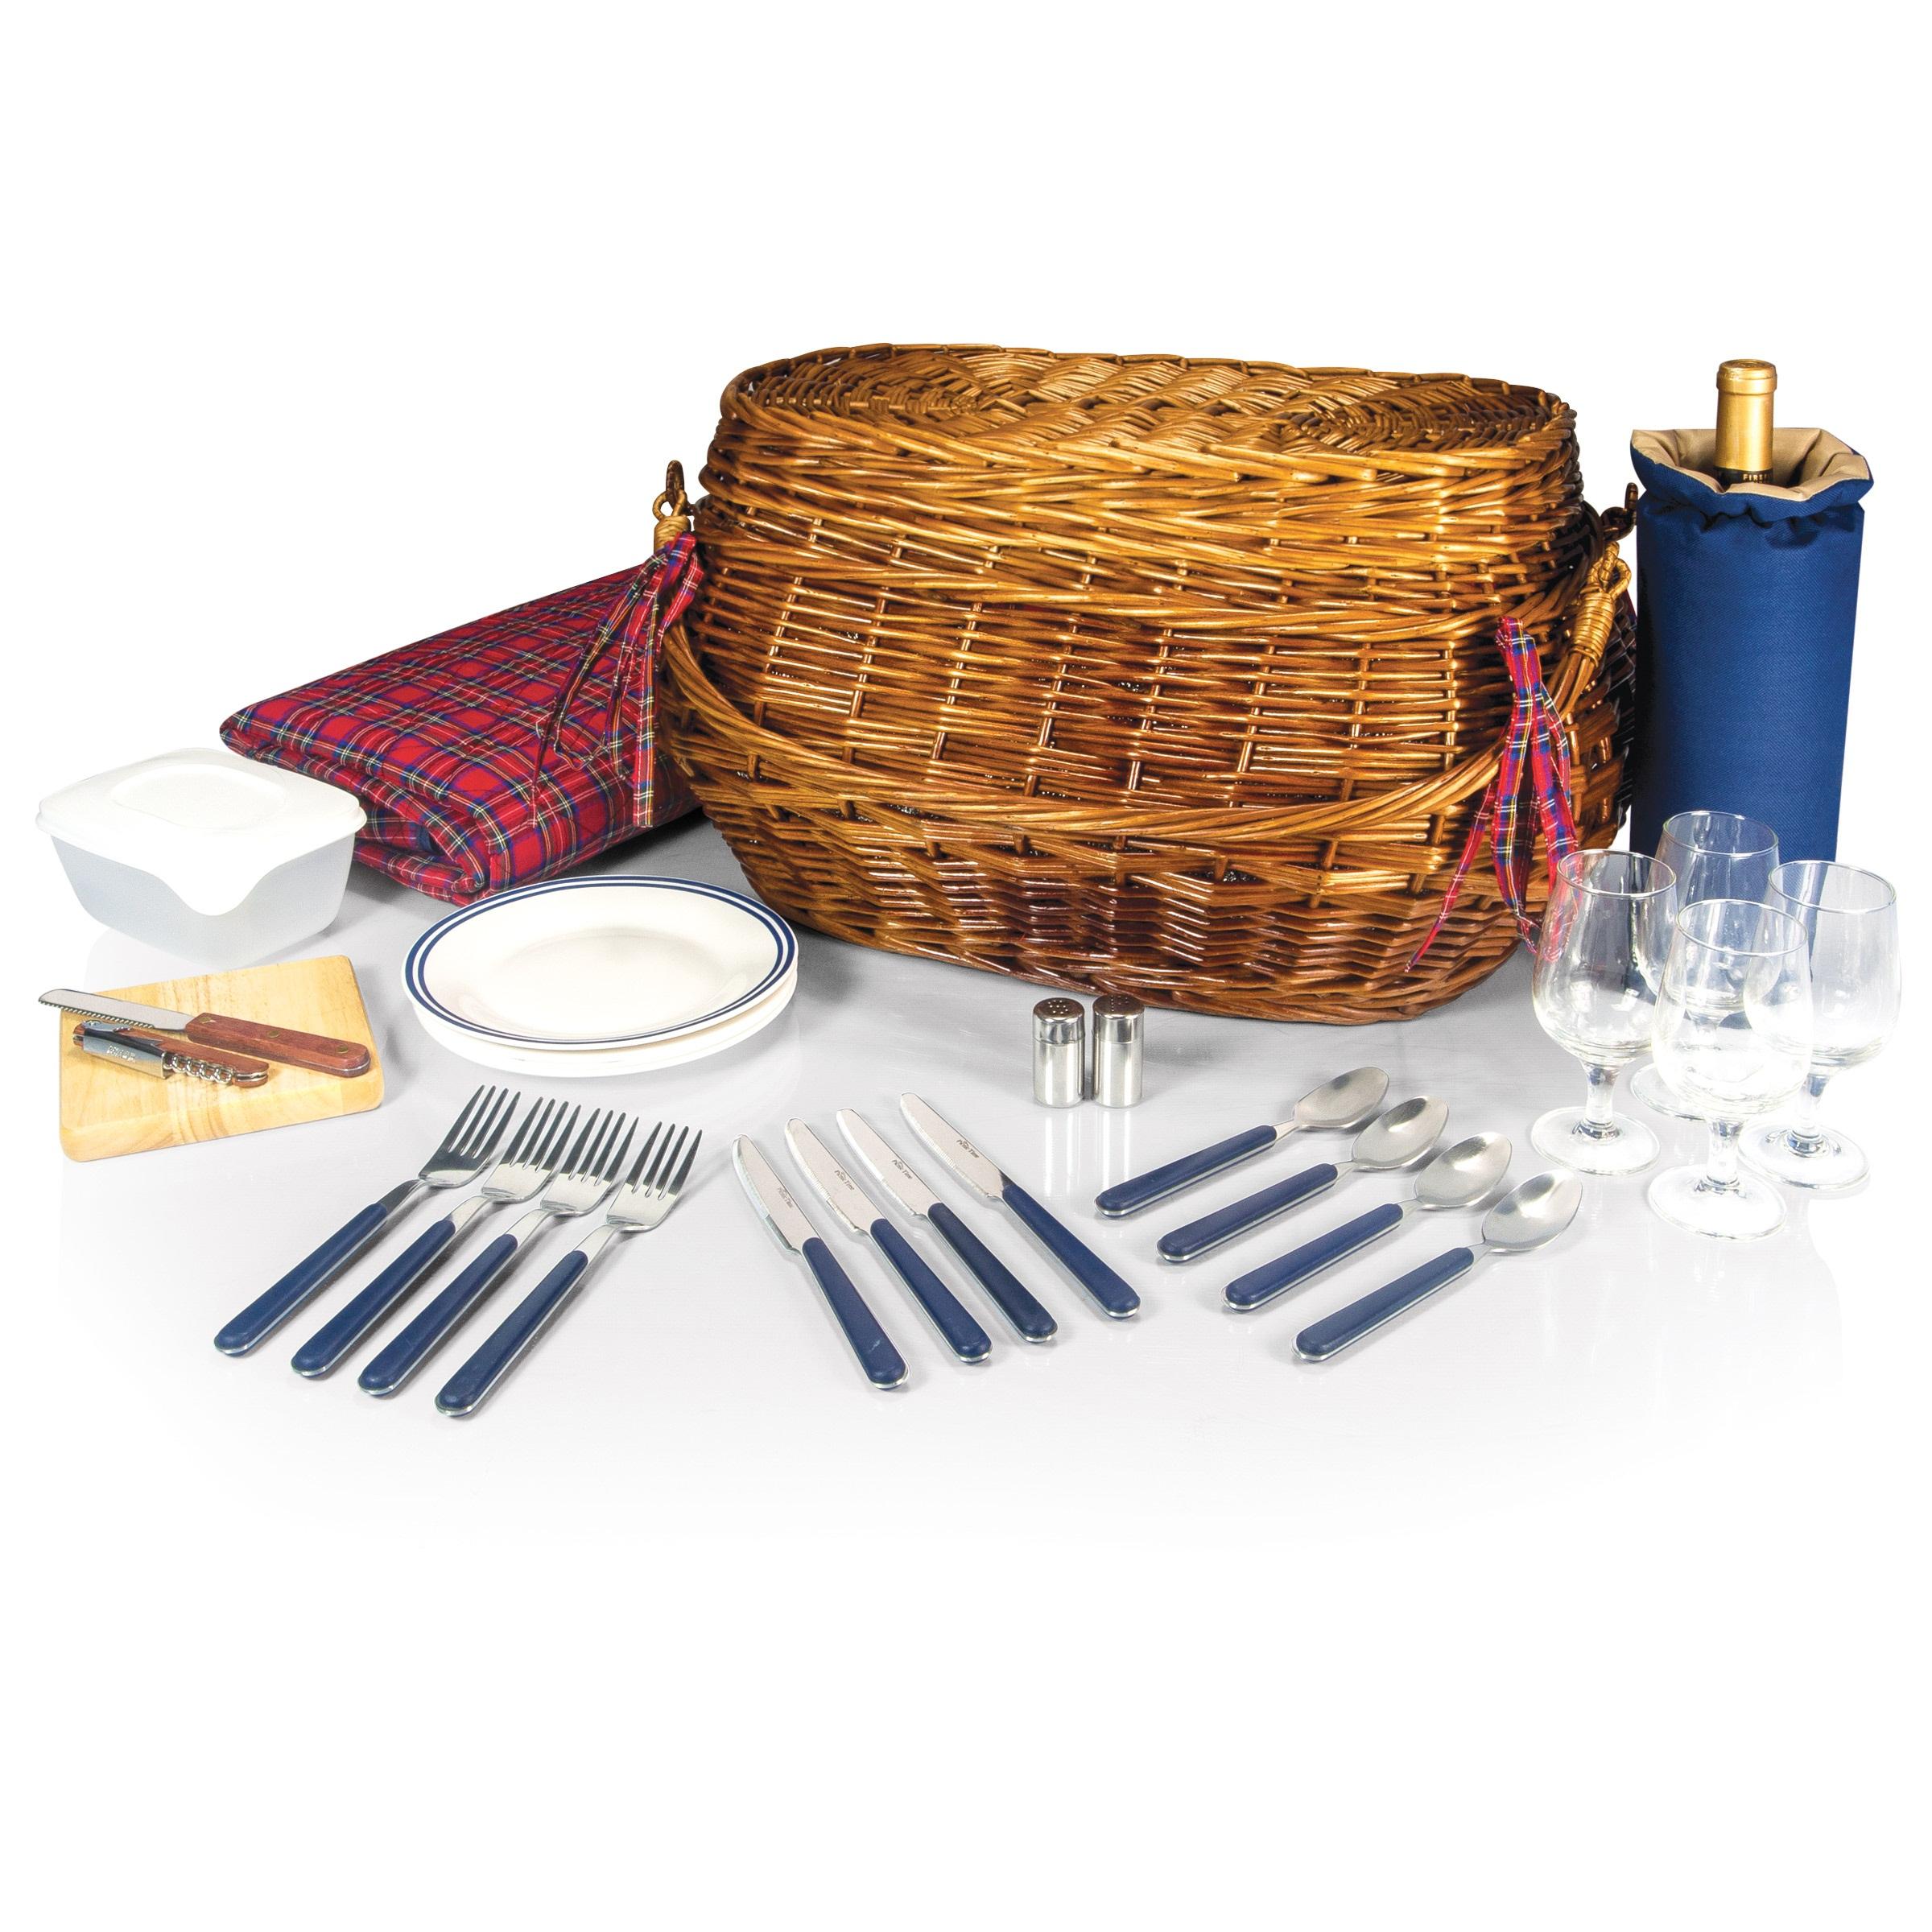 Highlander 4 Person Picnic Set in Blue or Olive Camping Fishing Picnics